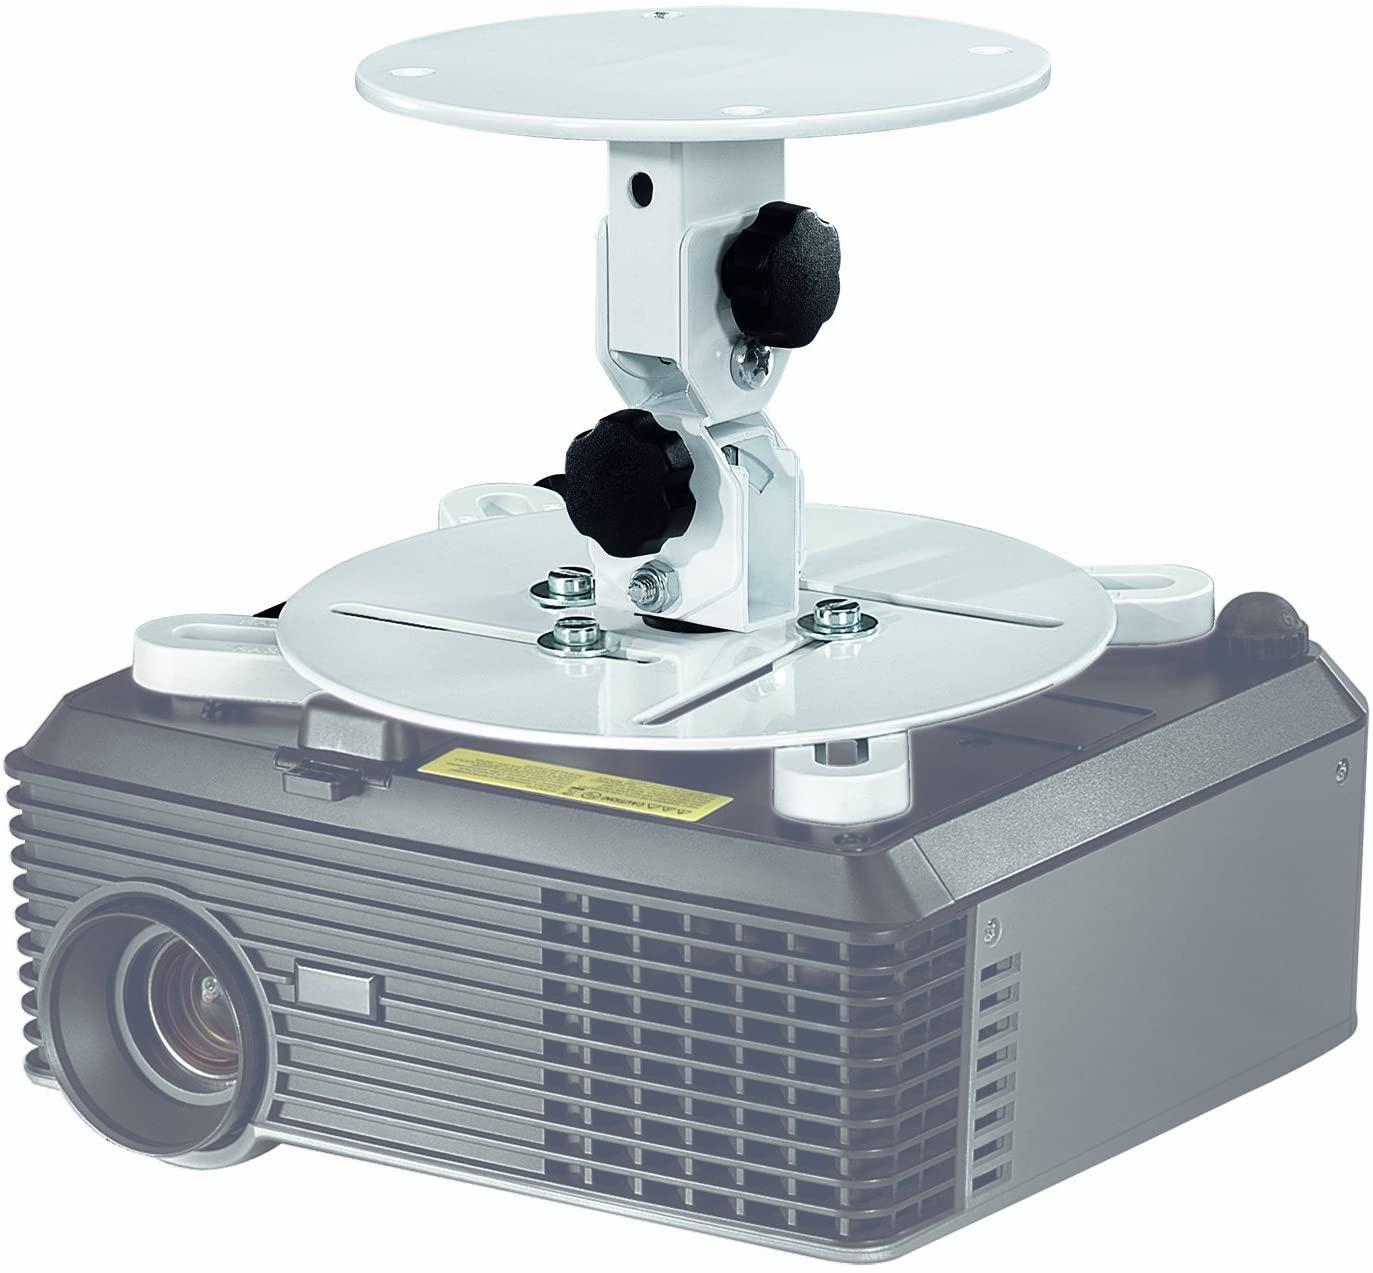 Hama 108767 - Universal Projector Stand